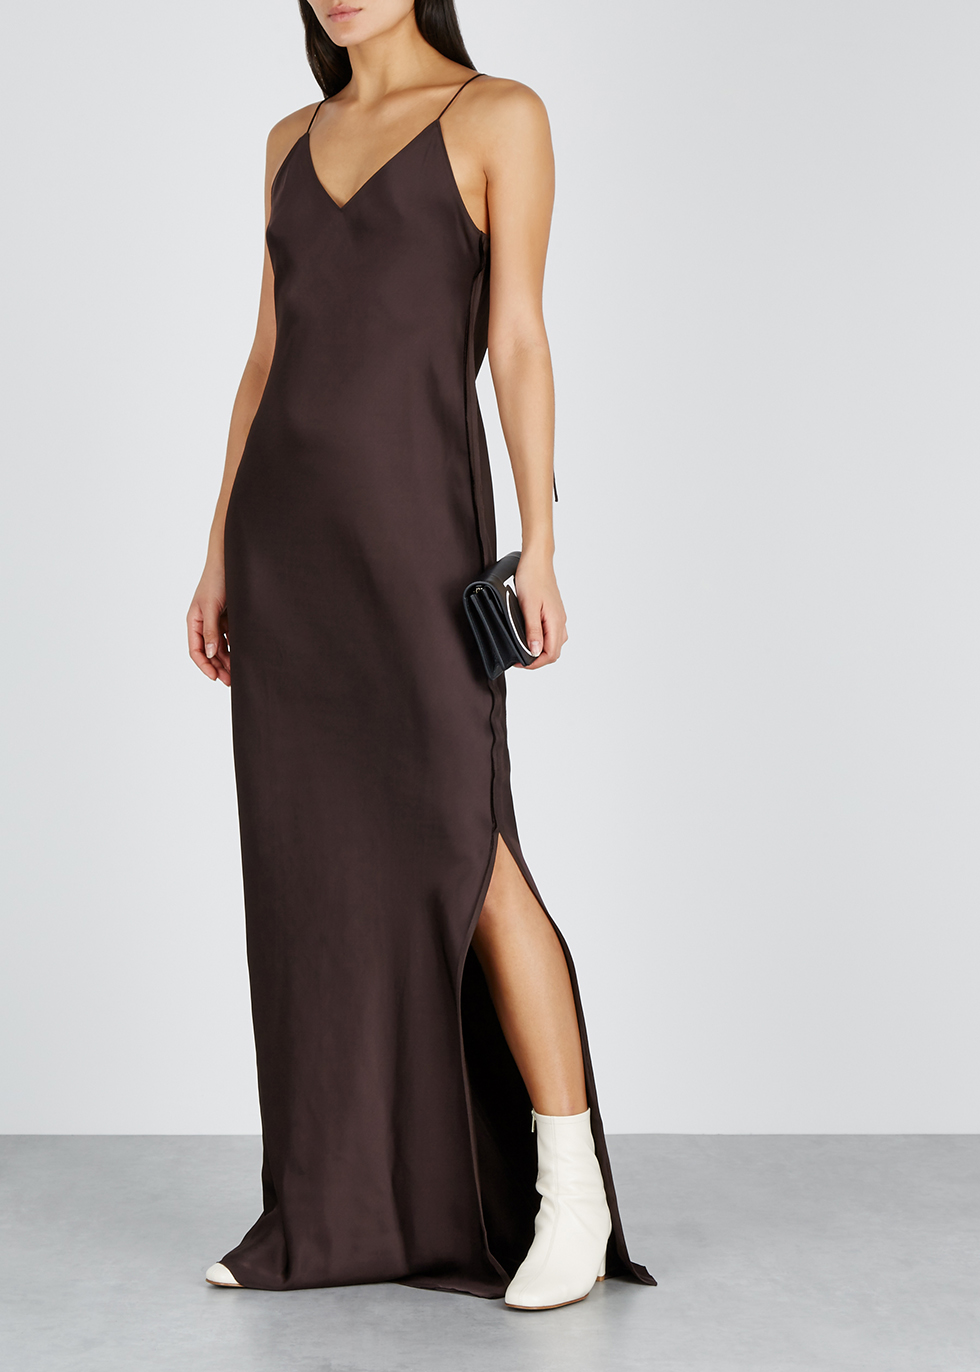 80296fb83660 Helmut Lang Dark brown satin maxi slip dress - Harvey Nichols